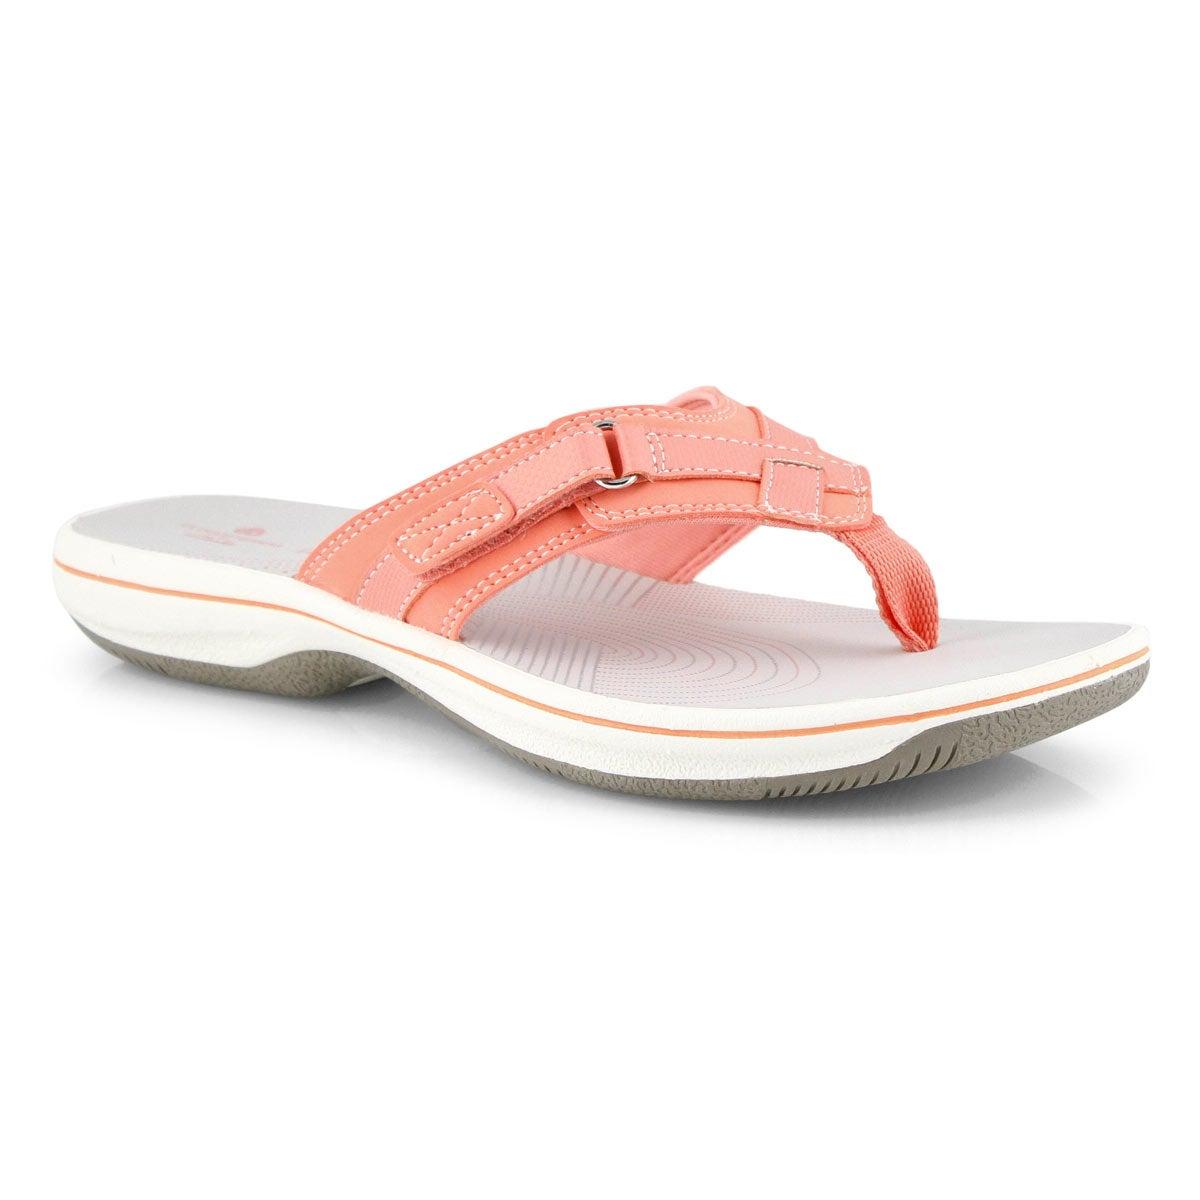 Lds Breeze Sea coral thong sandal